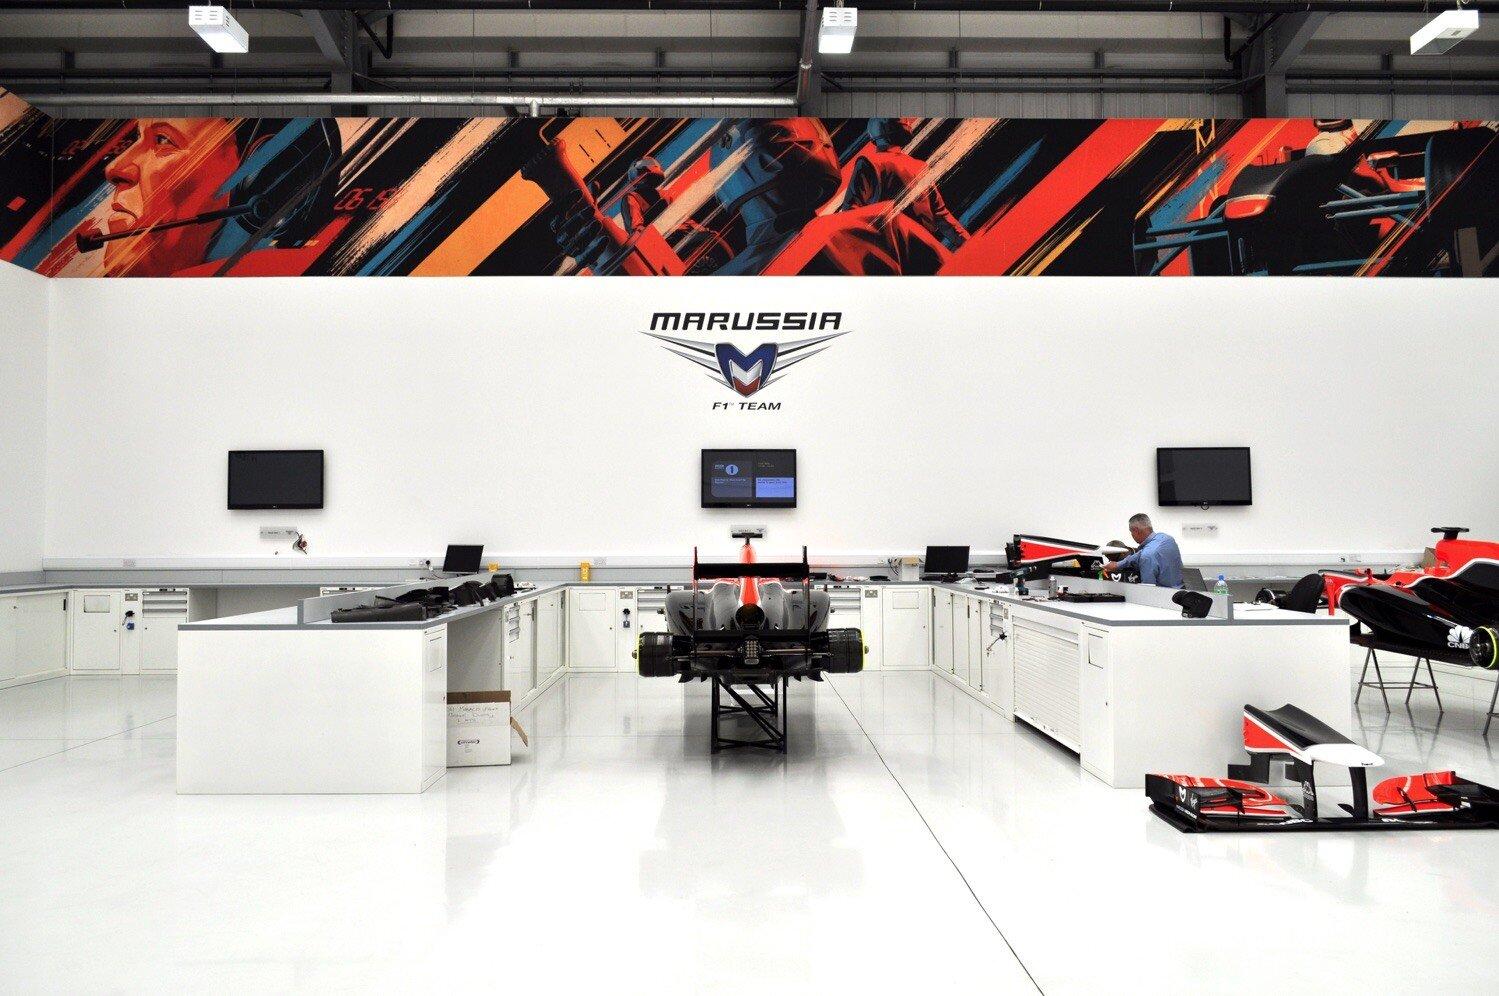 tavis-coburn-F1-team-graphic-illustration-marussia-35.jpg